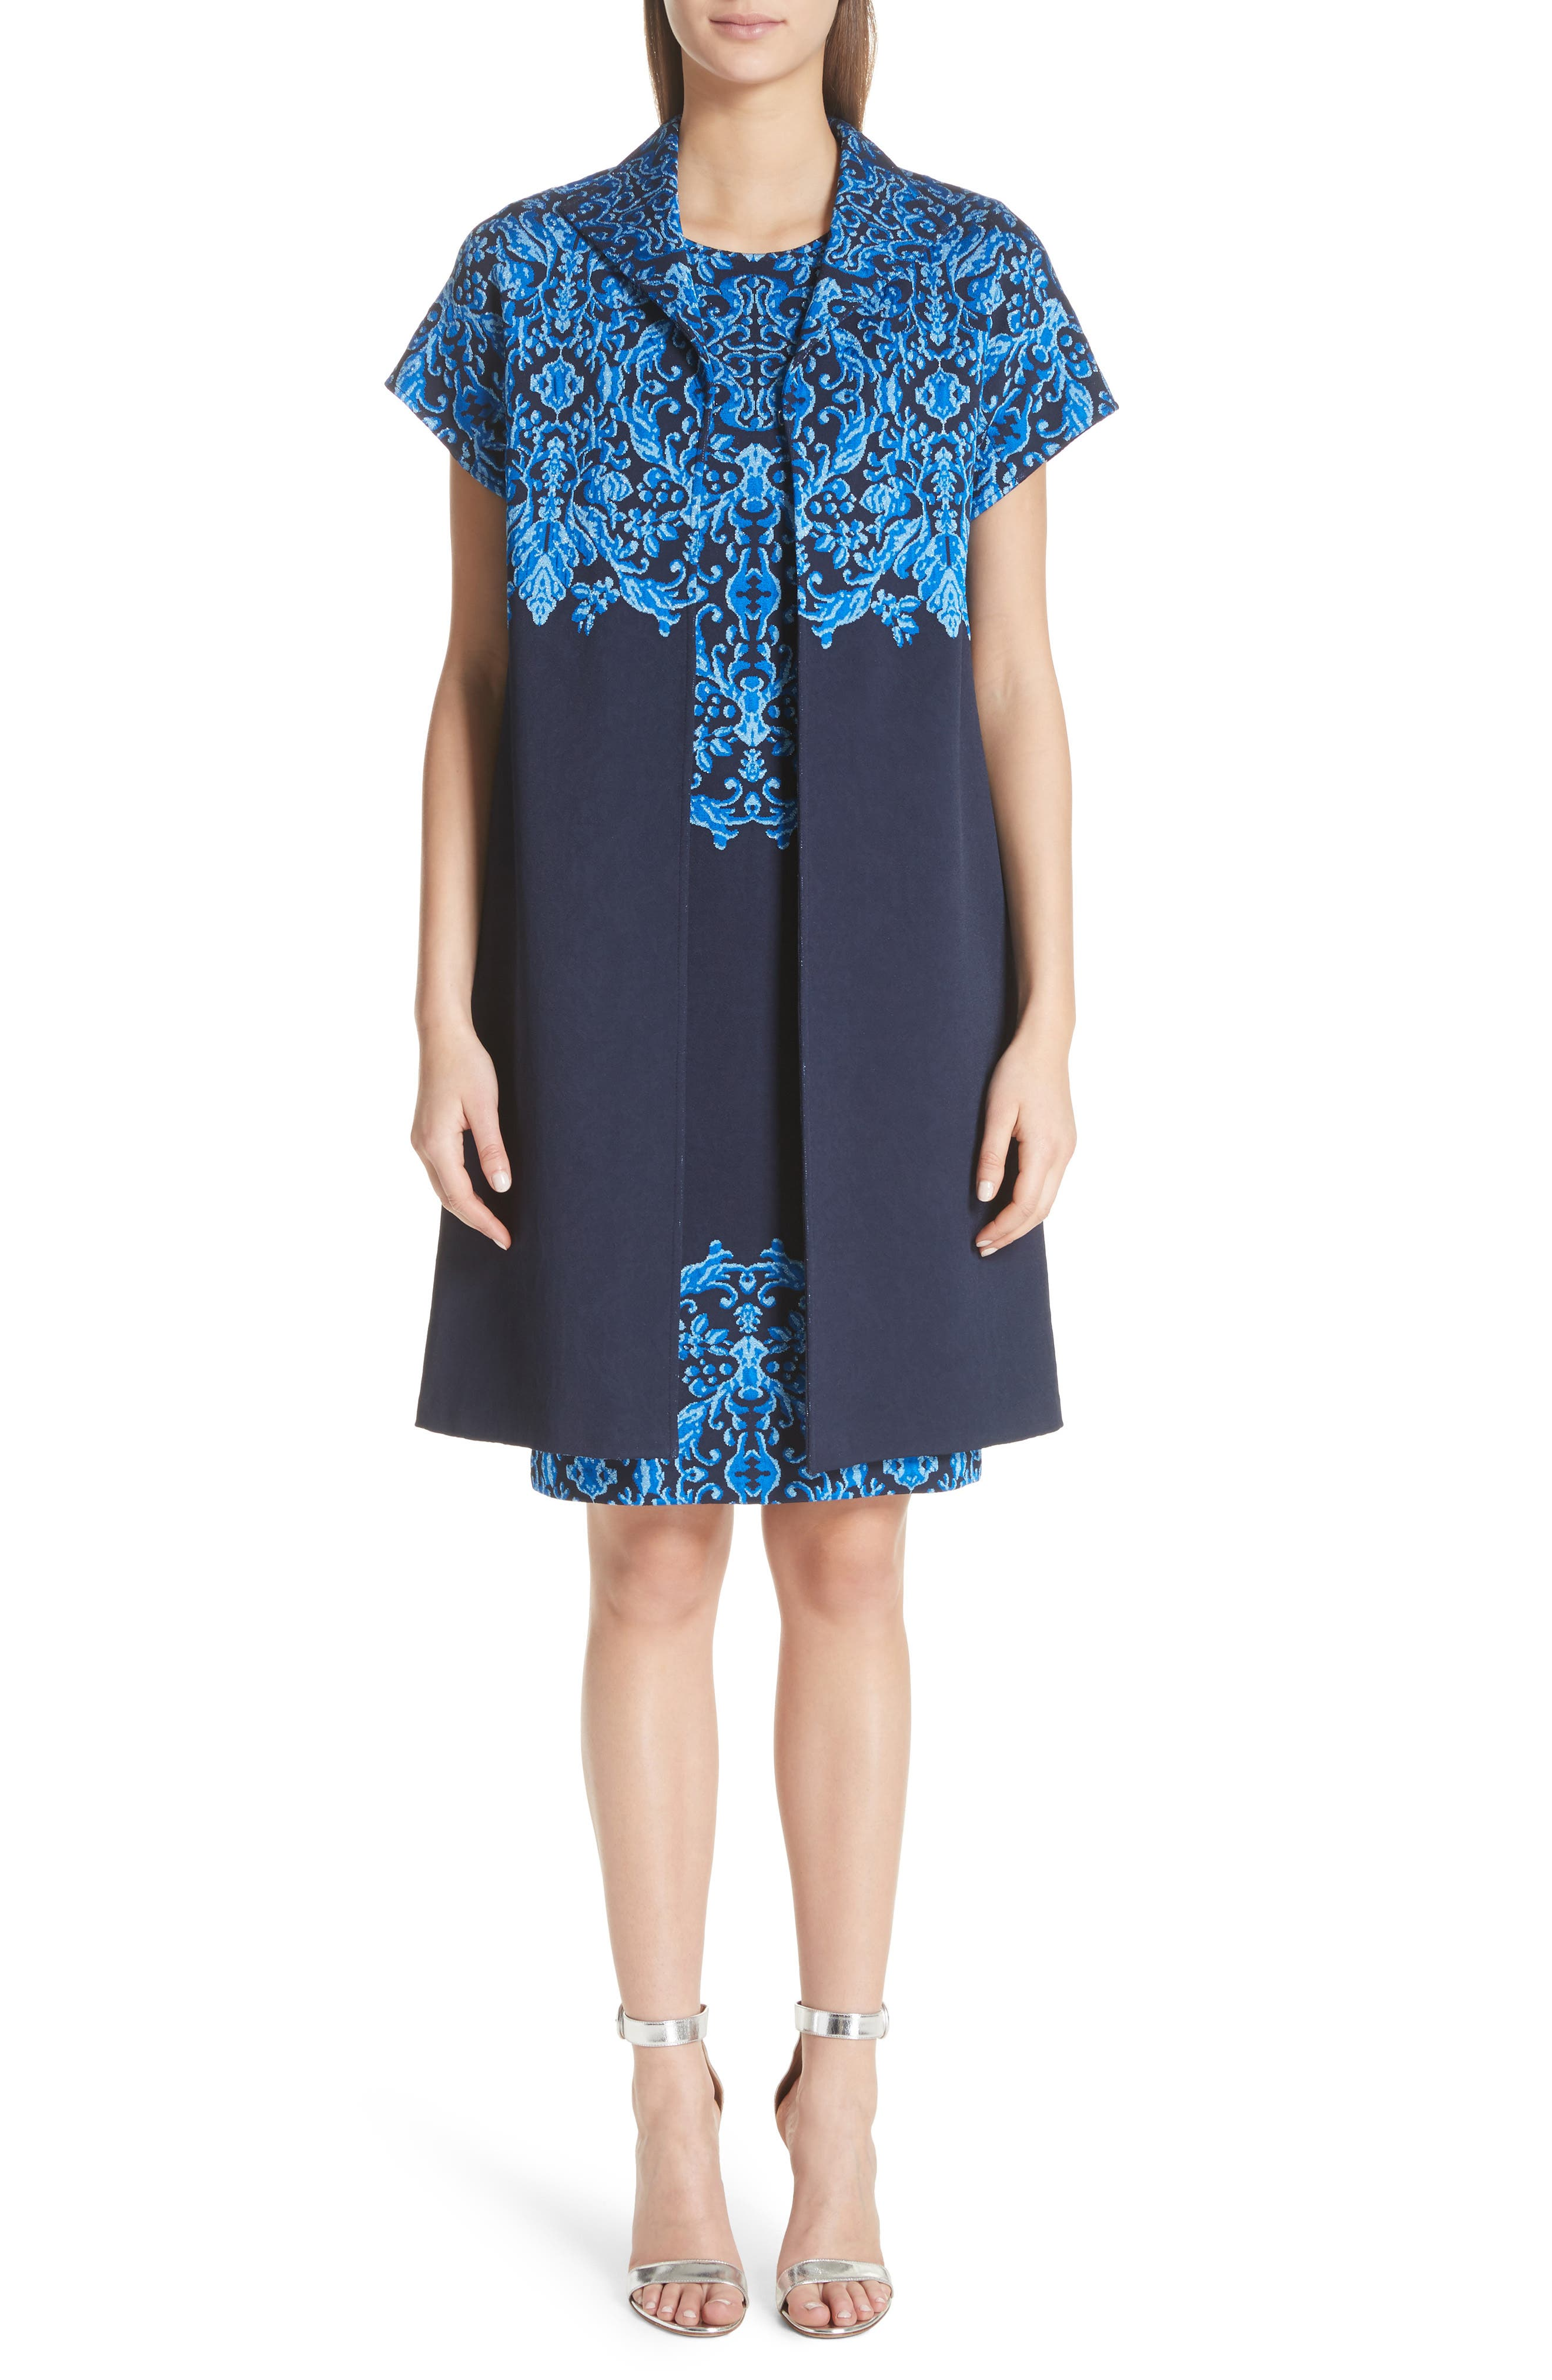 Cool Tones Brocade Knit Dress,                             Alternate thumbnail 8, color,                             COBALT MULTI